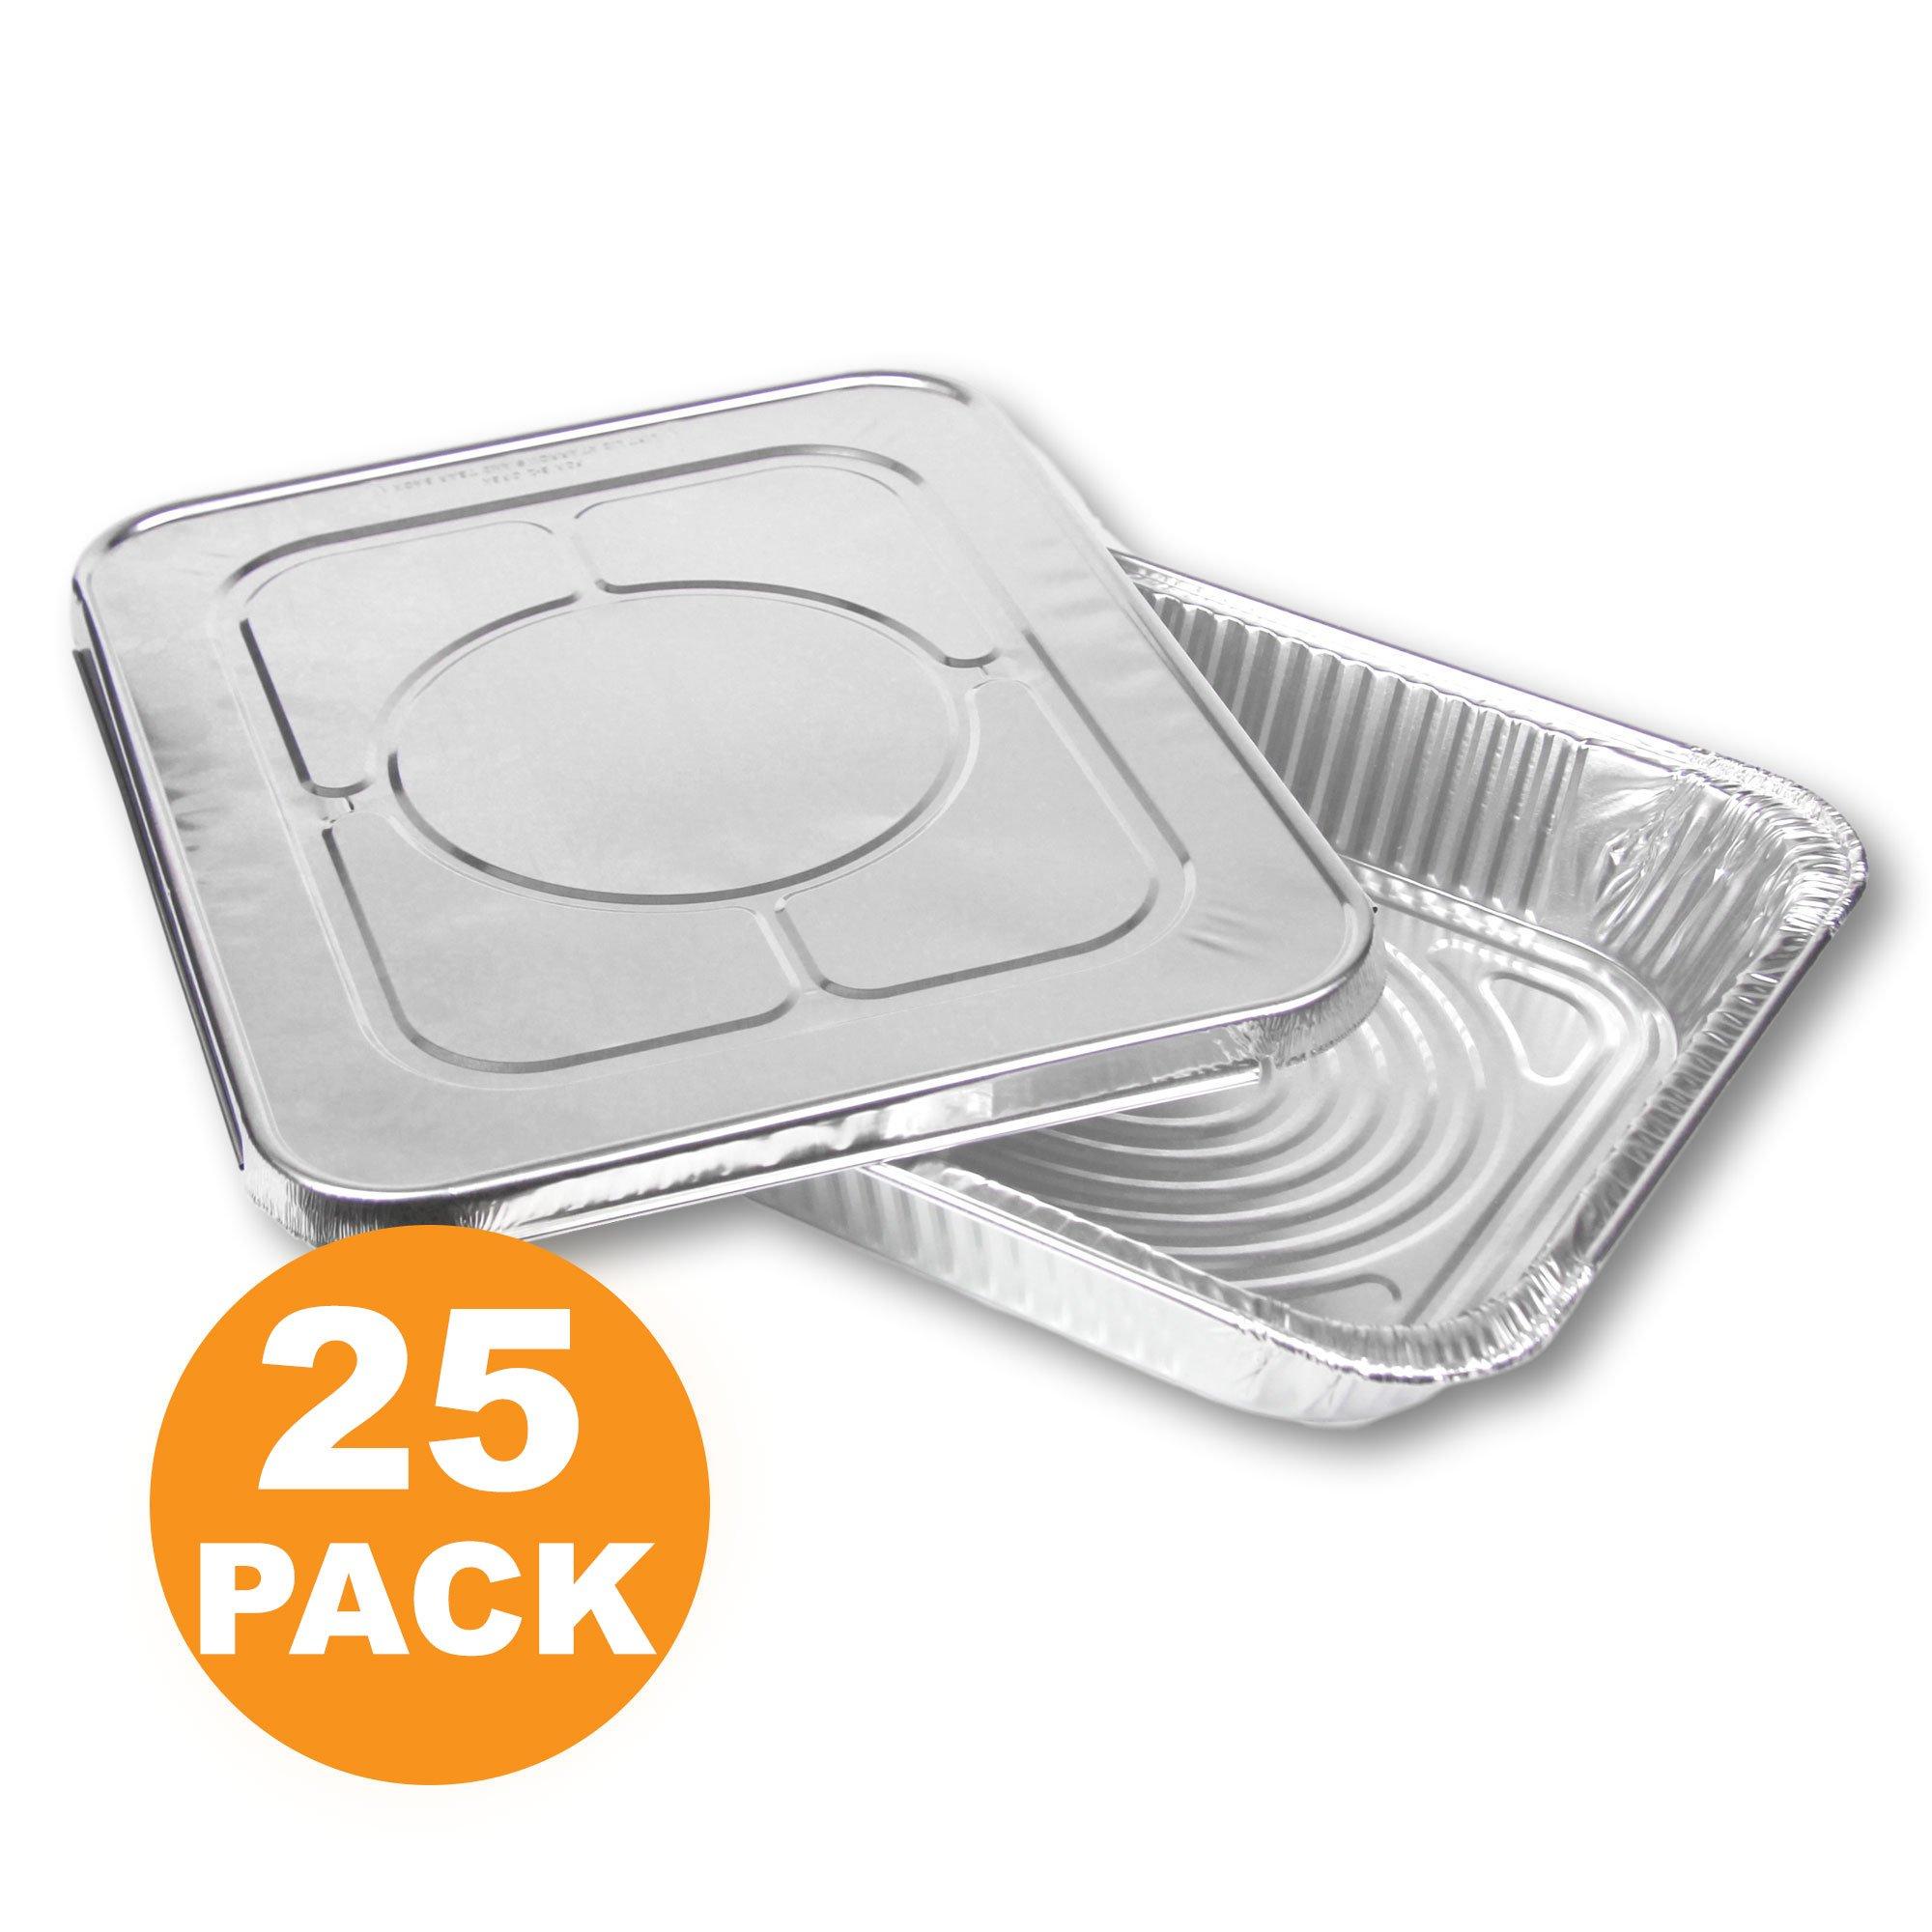 Large Rectangular Disposable Aluminum Foil Steam Table Baking Roast Pans with Flat Lids, Half Size 13 x 10 [25 Pack]